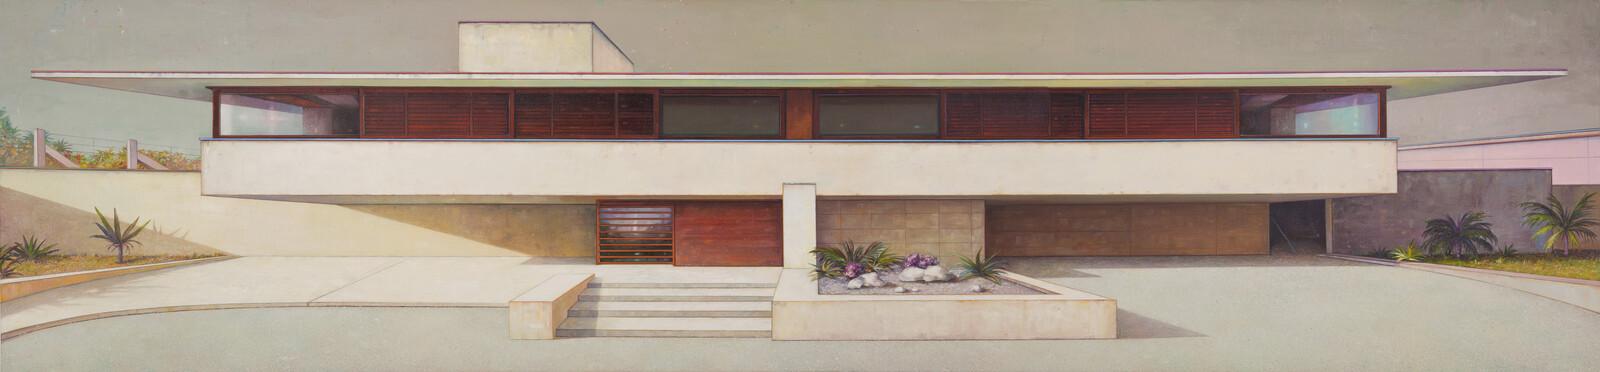 Brasilian House by Jens Hausmann Buy pictures photo art online